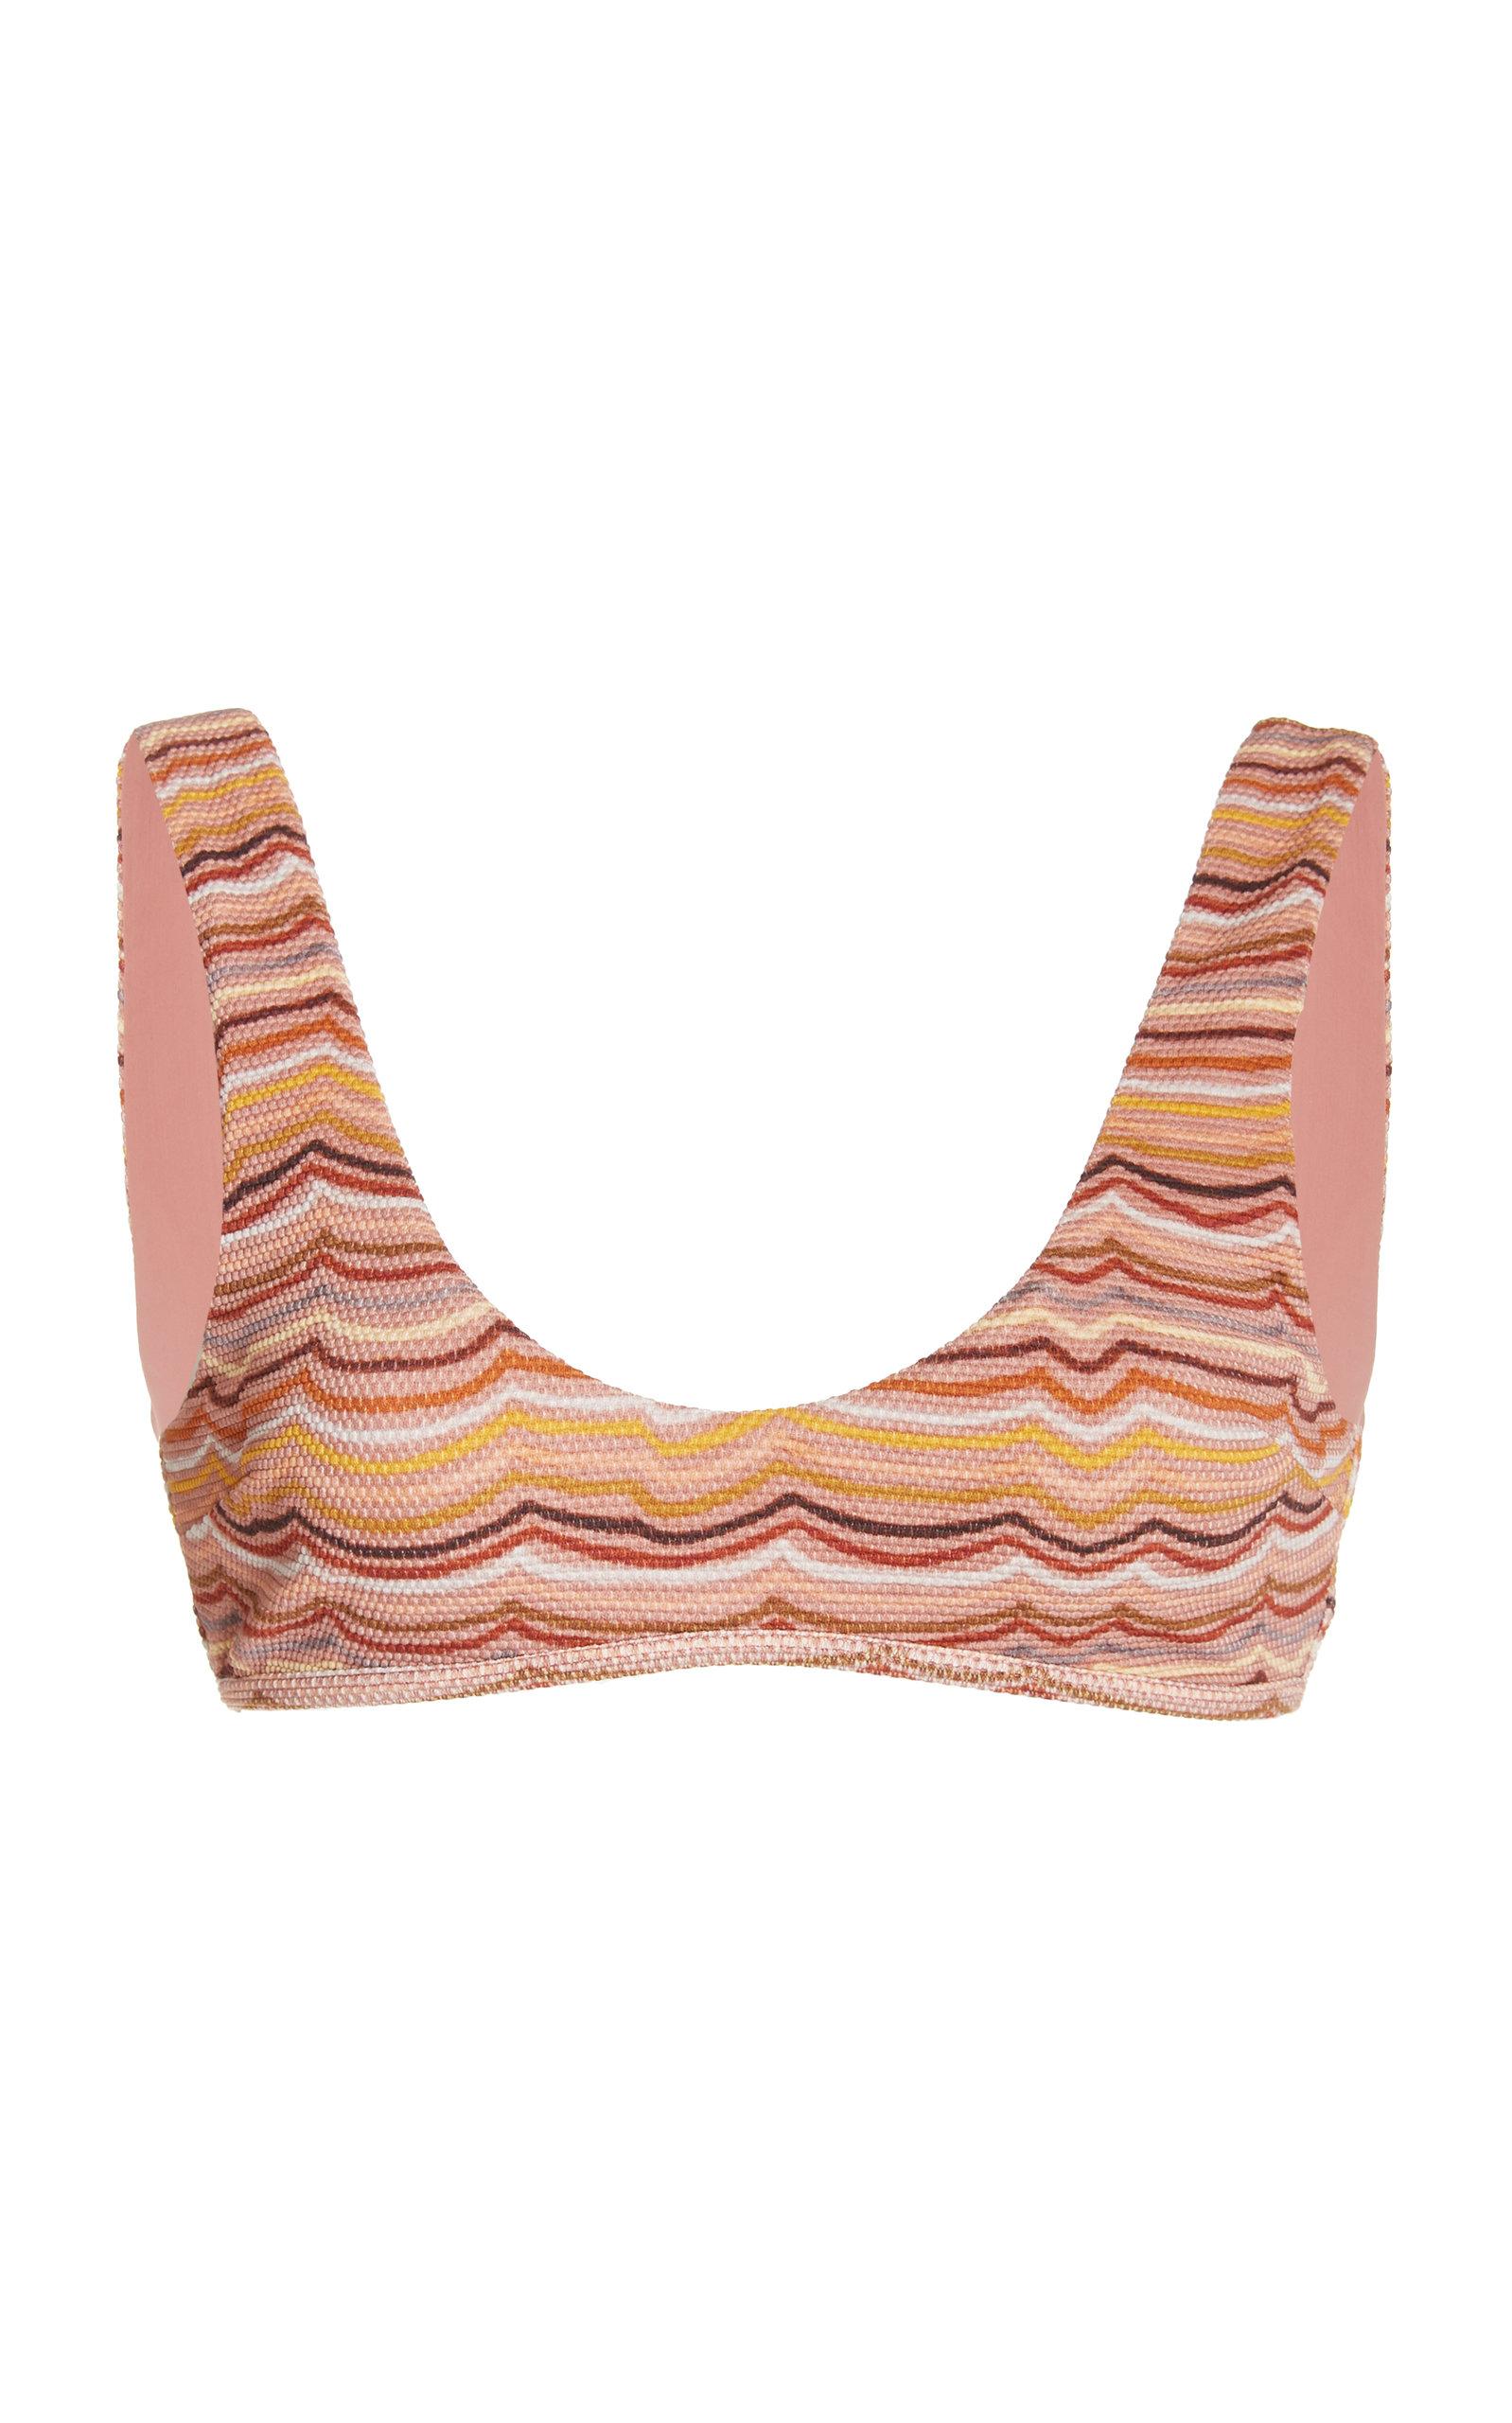 Women's Alfie Printed Bikini Top